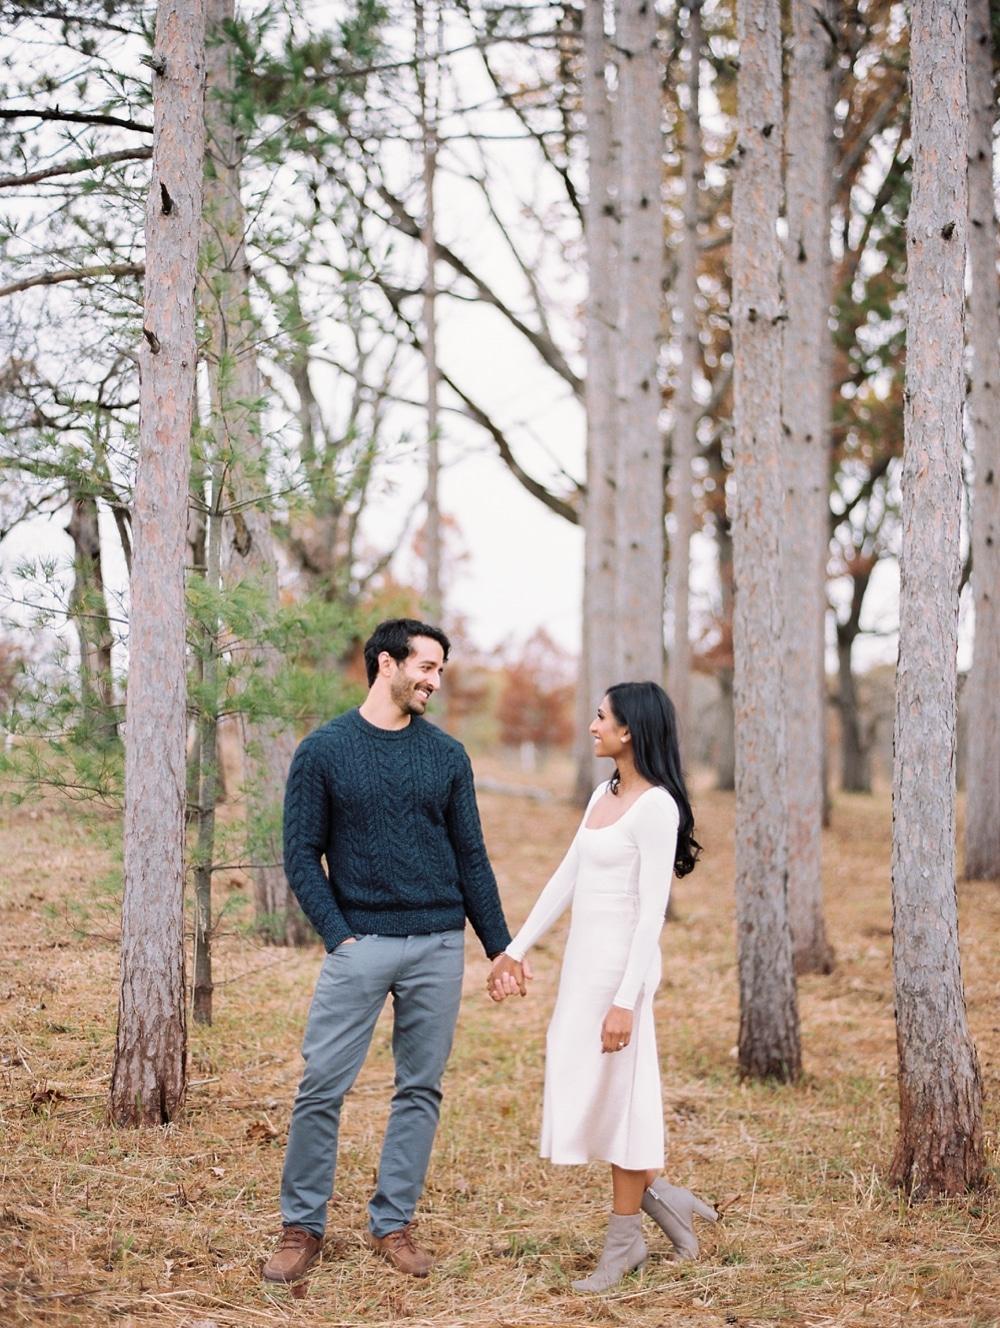 Kristin-La-Voie-Photography-morton-arboretum-chicago-wedding-photographer-69